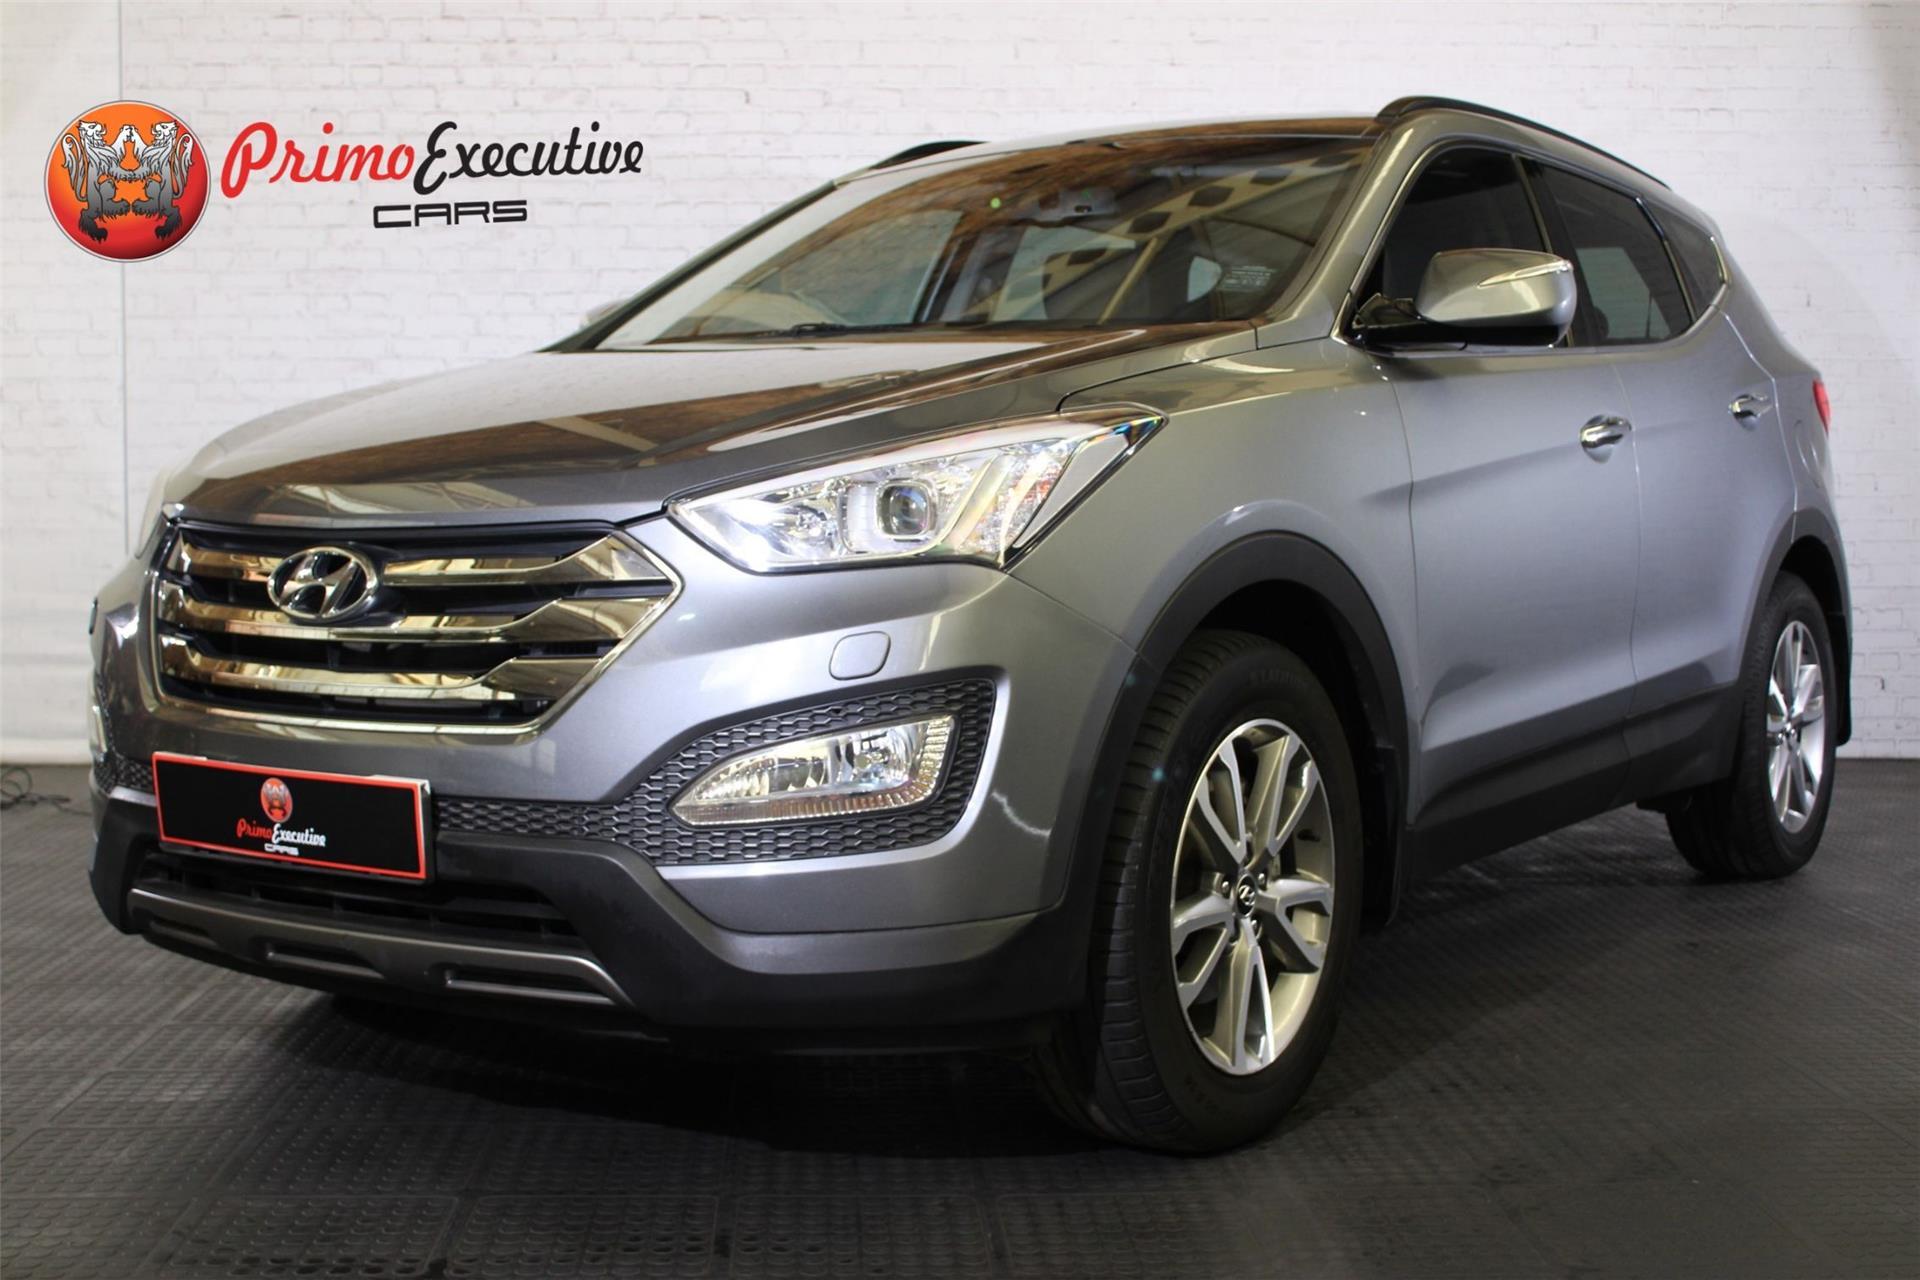 Hyundai Santa Fe 2.2CRDi 4WD Elite